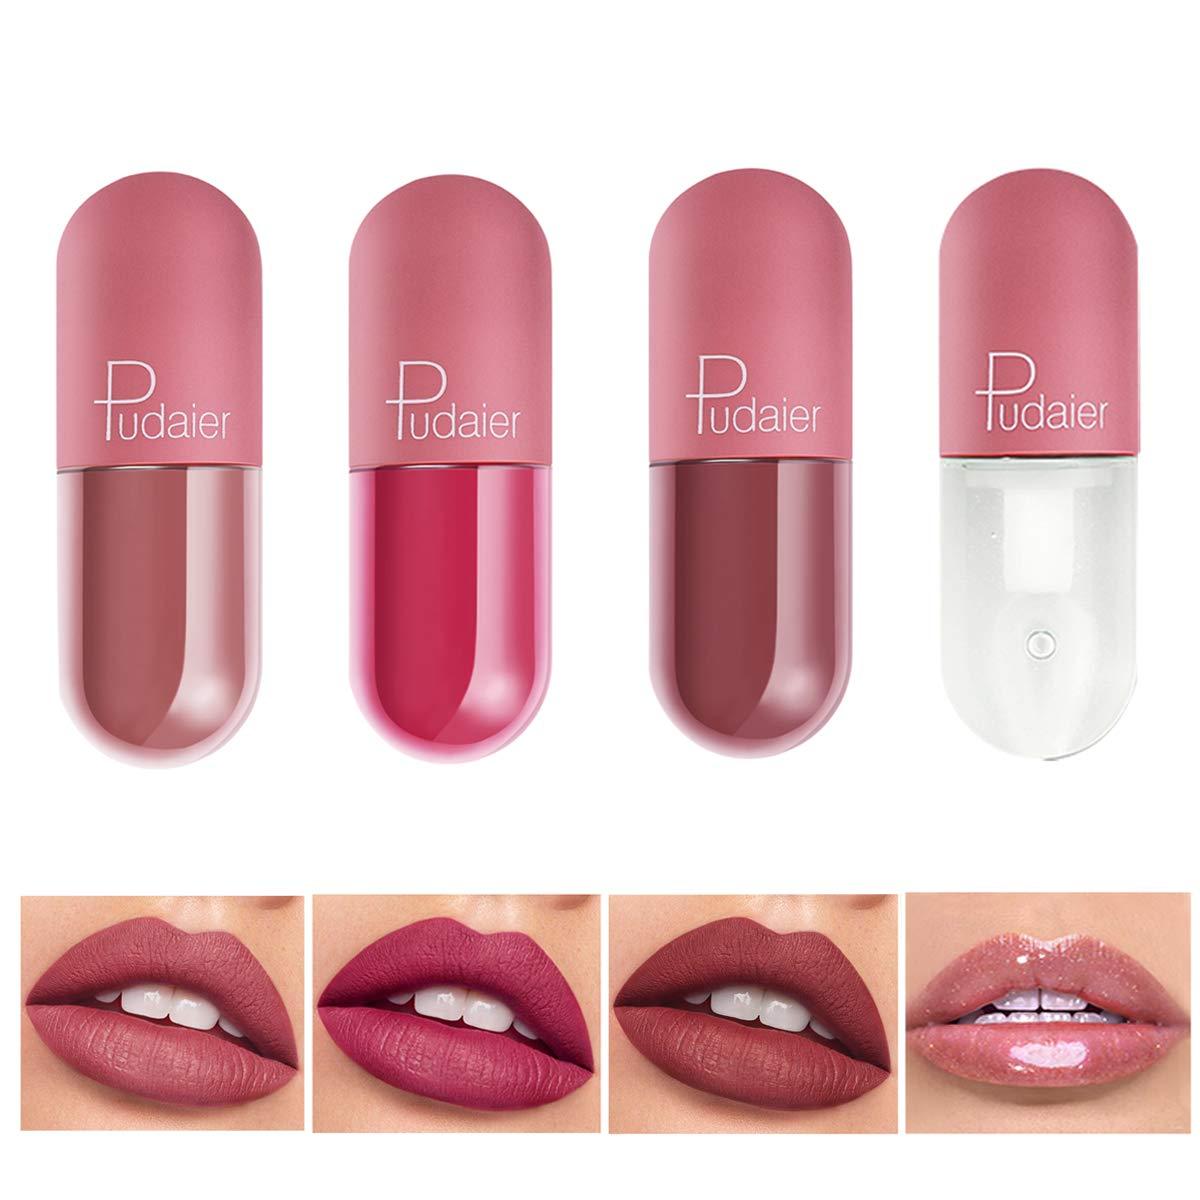 Capsule Matte Superstay Lipstick, COOSA 4 PCS Mini Nude Waterproof Long Lasting Liquid Lipsticks with Lip Plumper Gloss (SET02-4PCS)